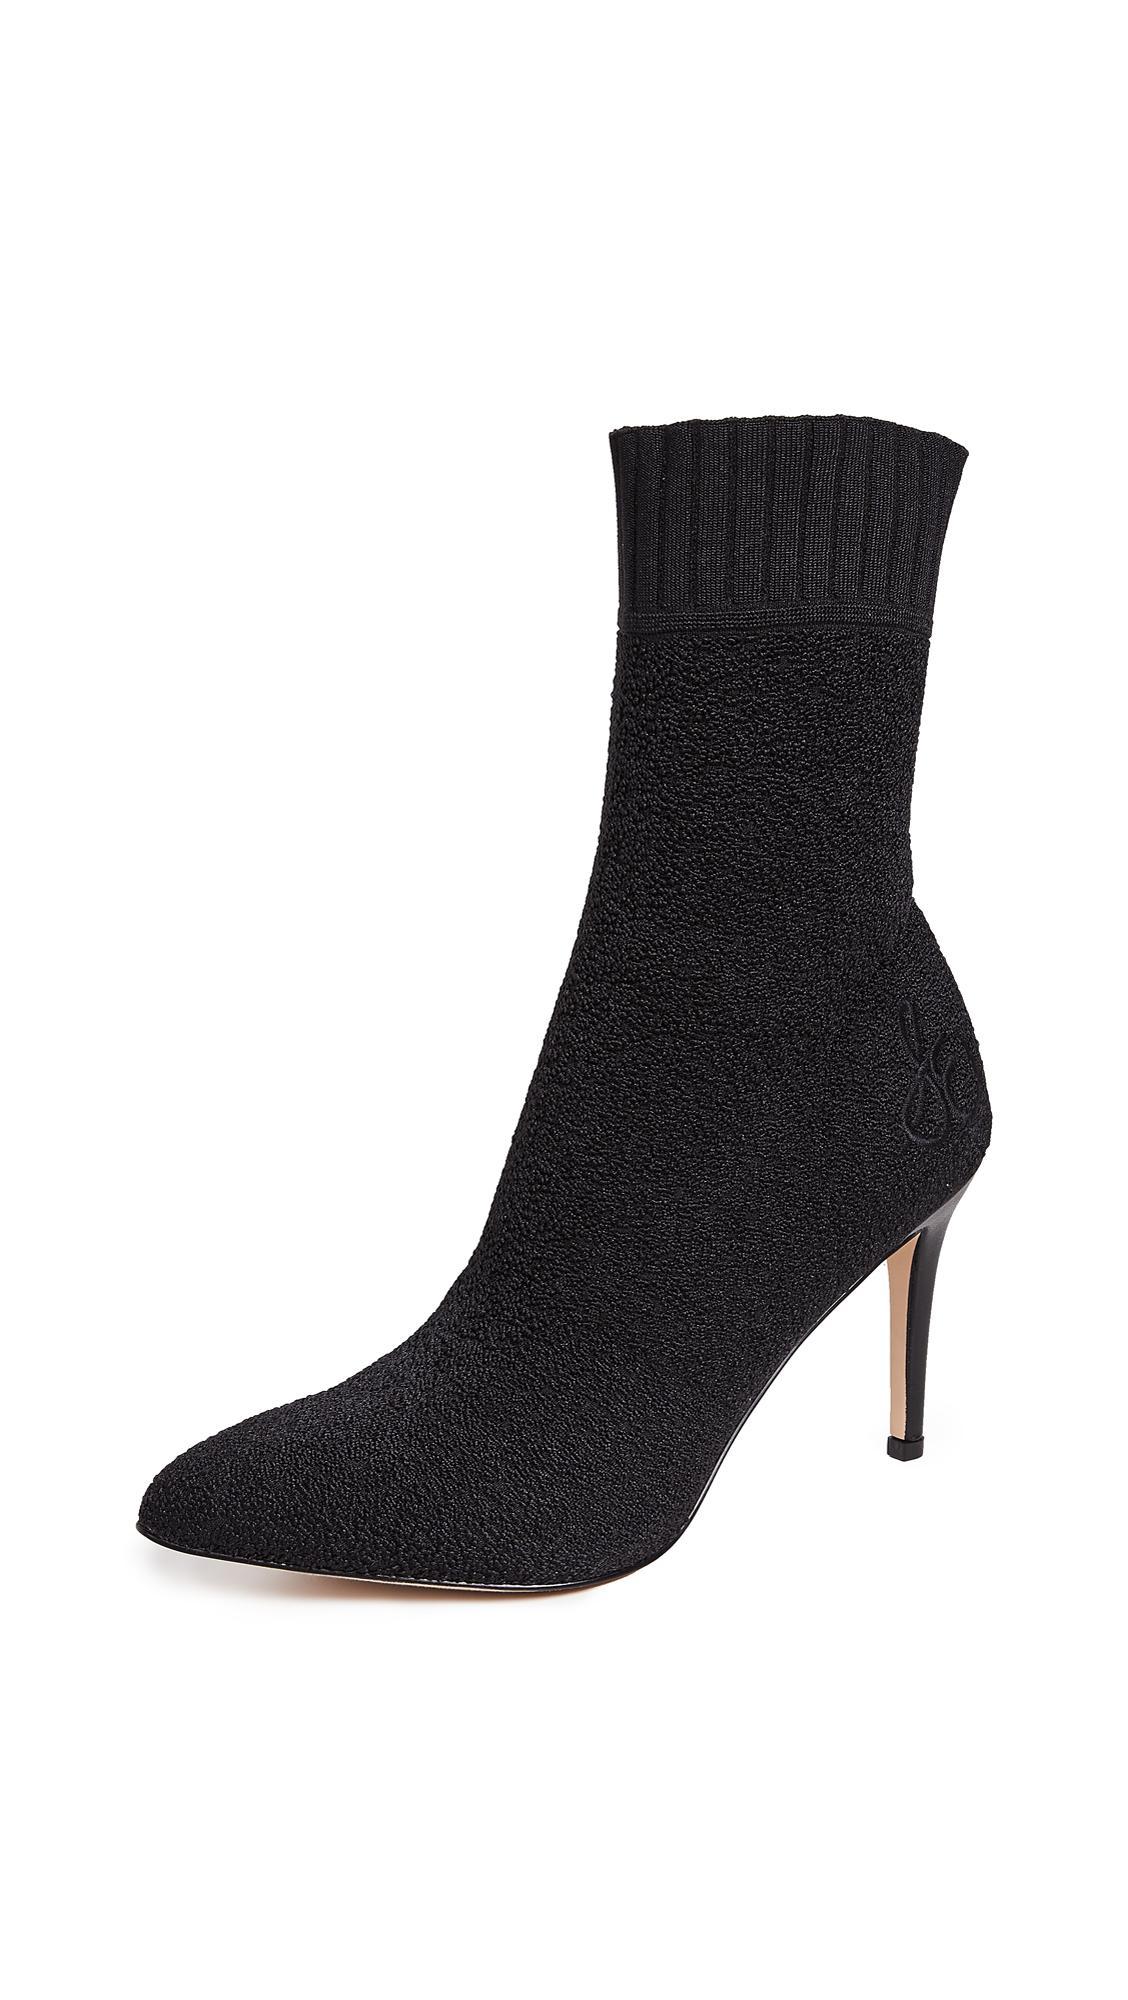 5d0951c7e Sam Edelman Oksana Sock Booties In Black